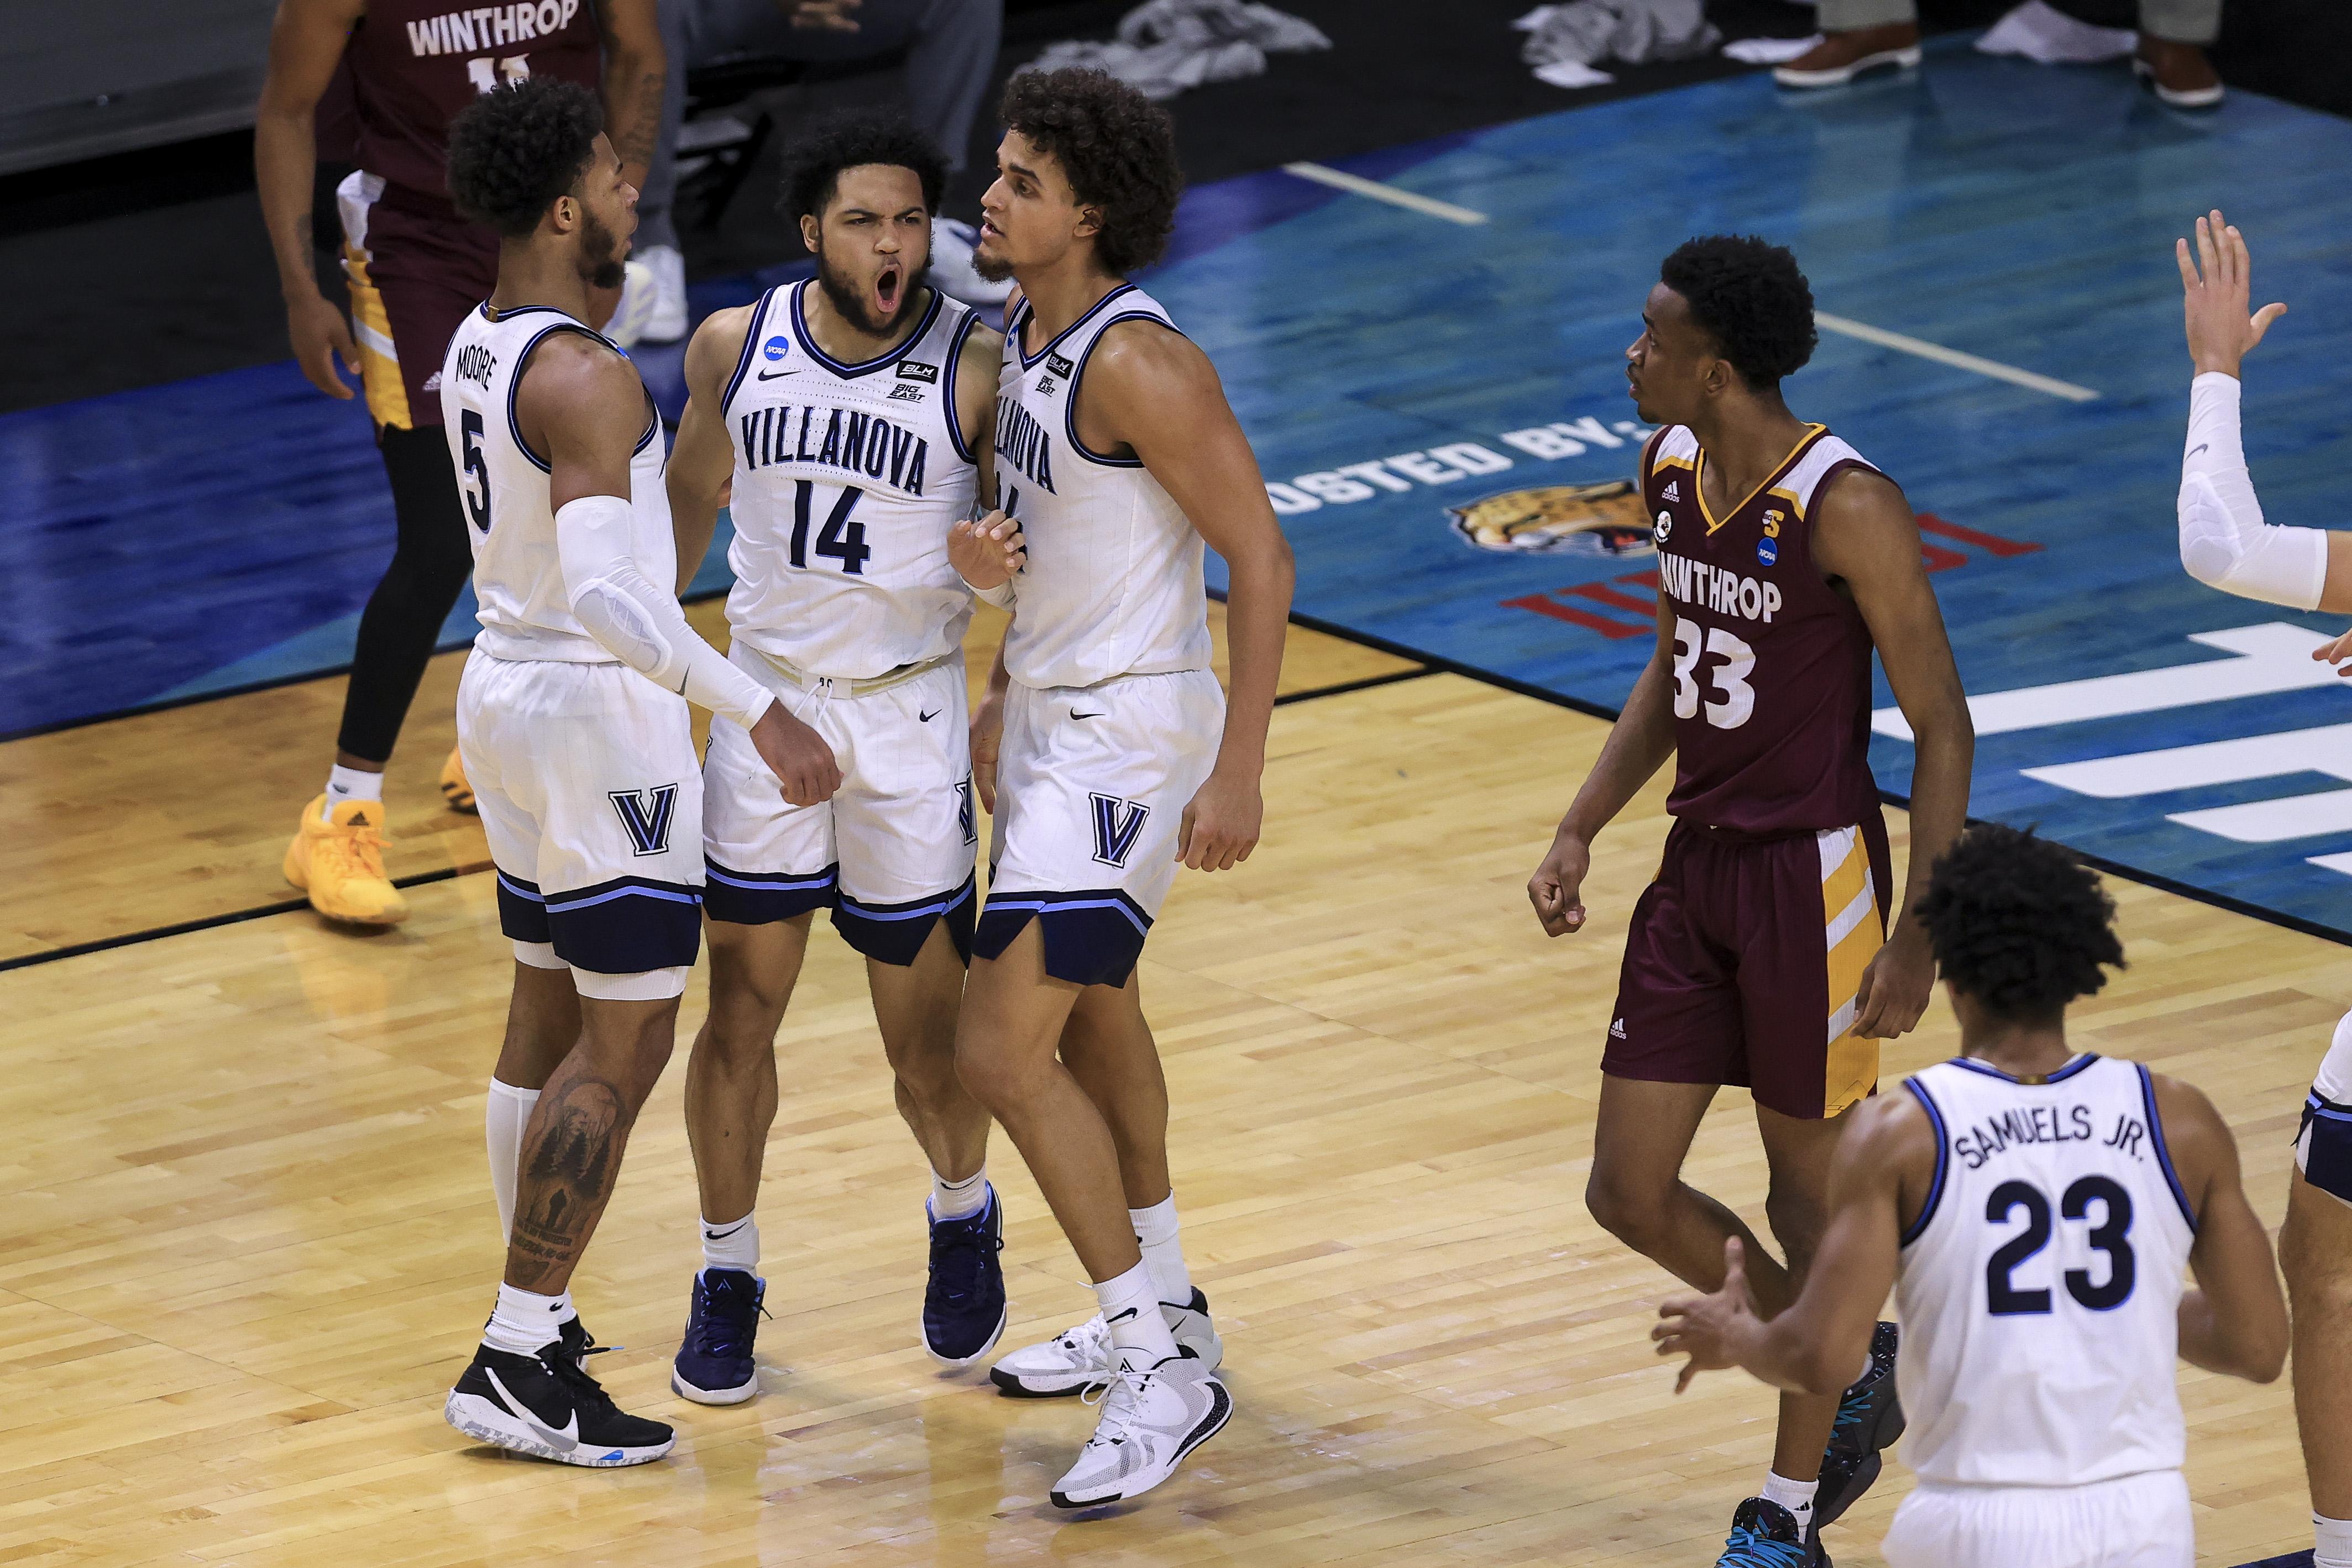 NCAA Basketball: NCAA Tournament-Winthrop at Villanova